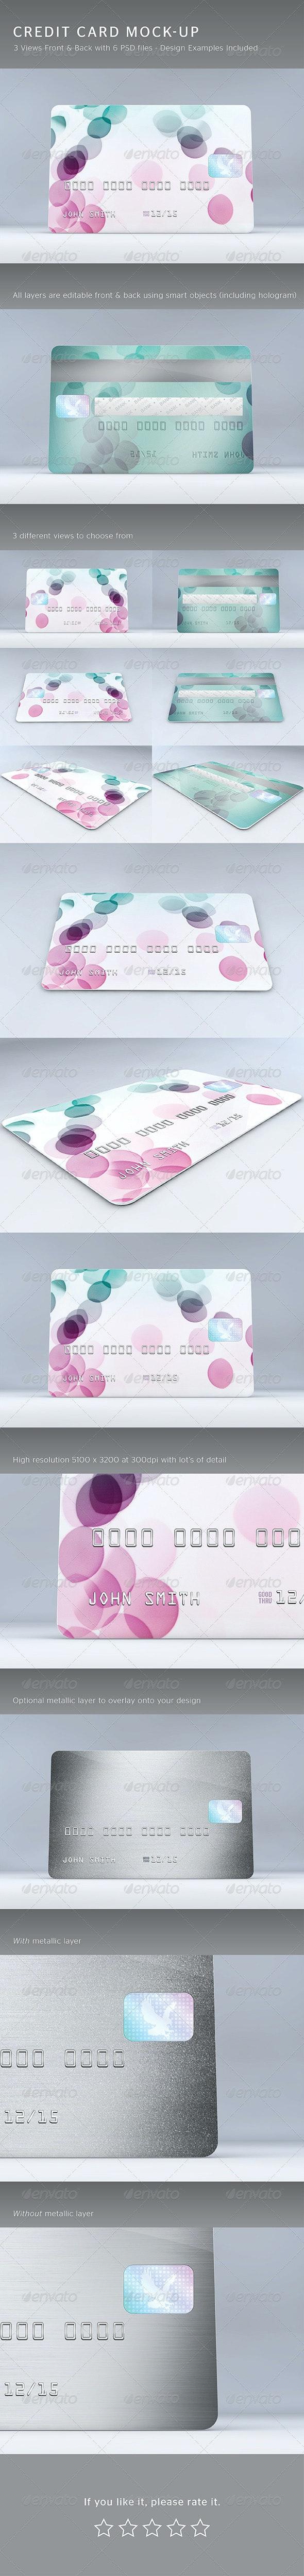 Credit Card Mock-Up - Print Product Mock-Ups